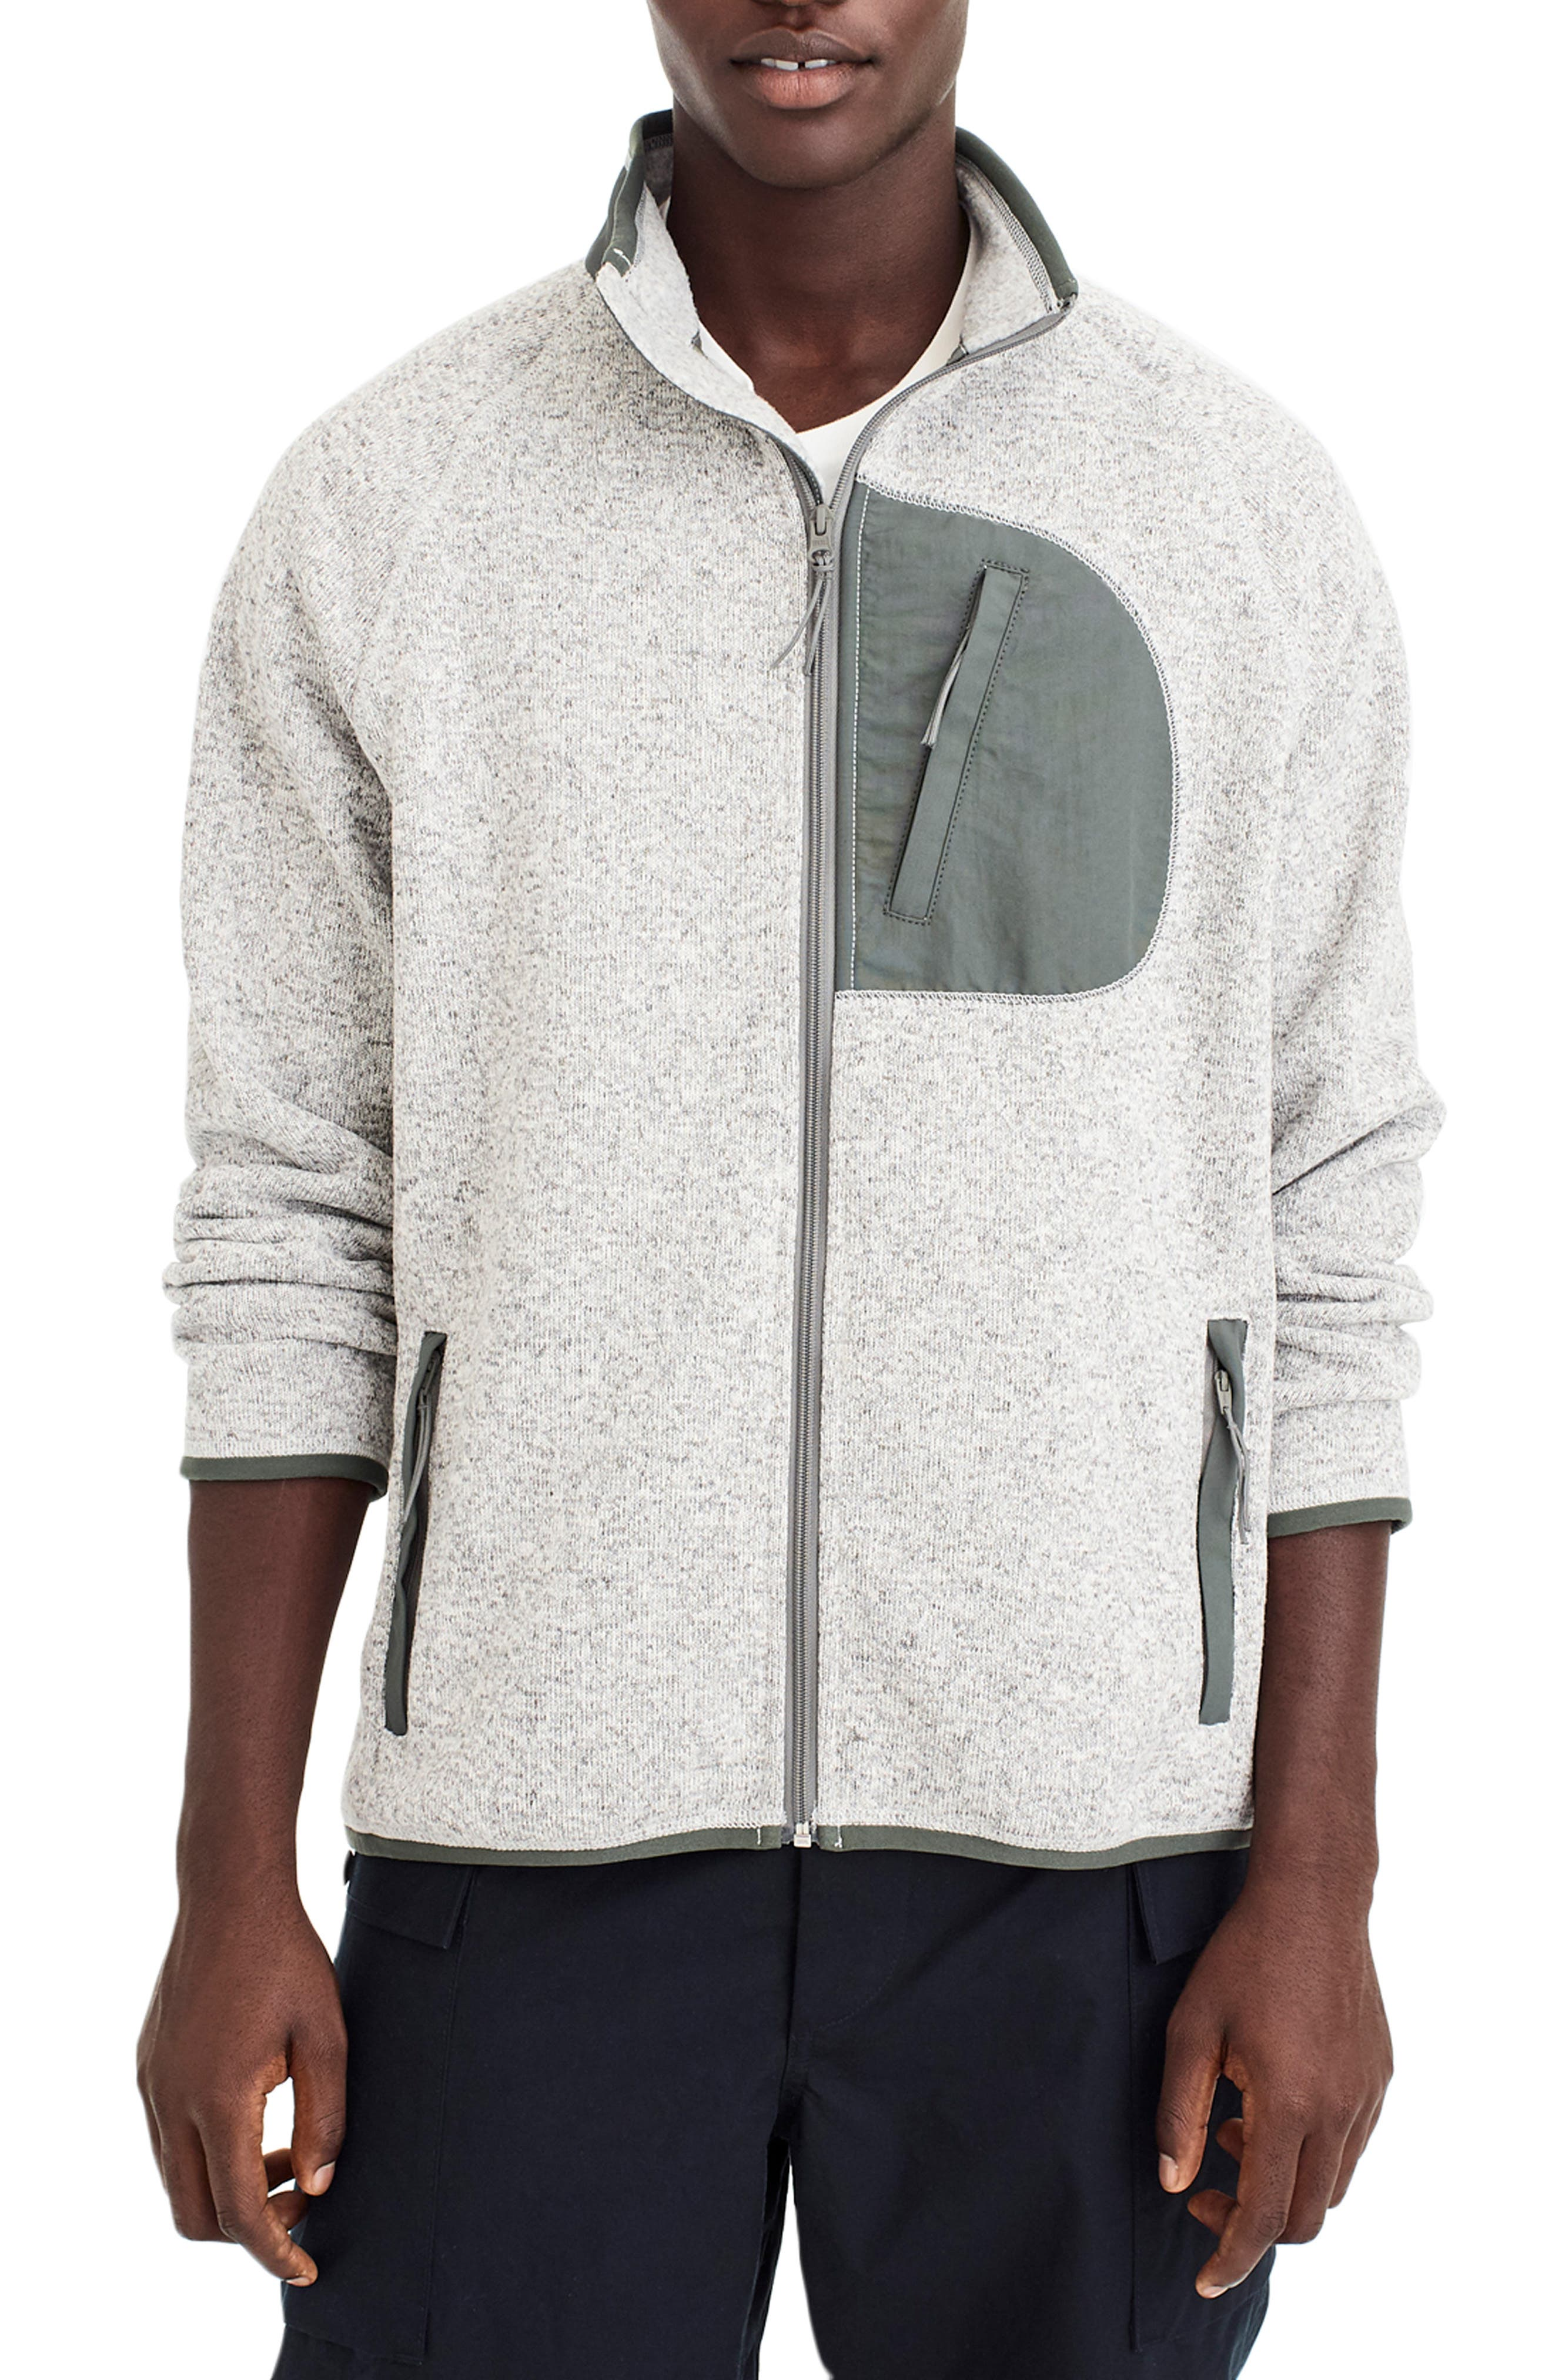 J.crew Classic Fit Fleece Sweater Jacket, Grey